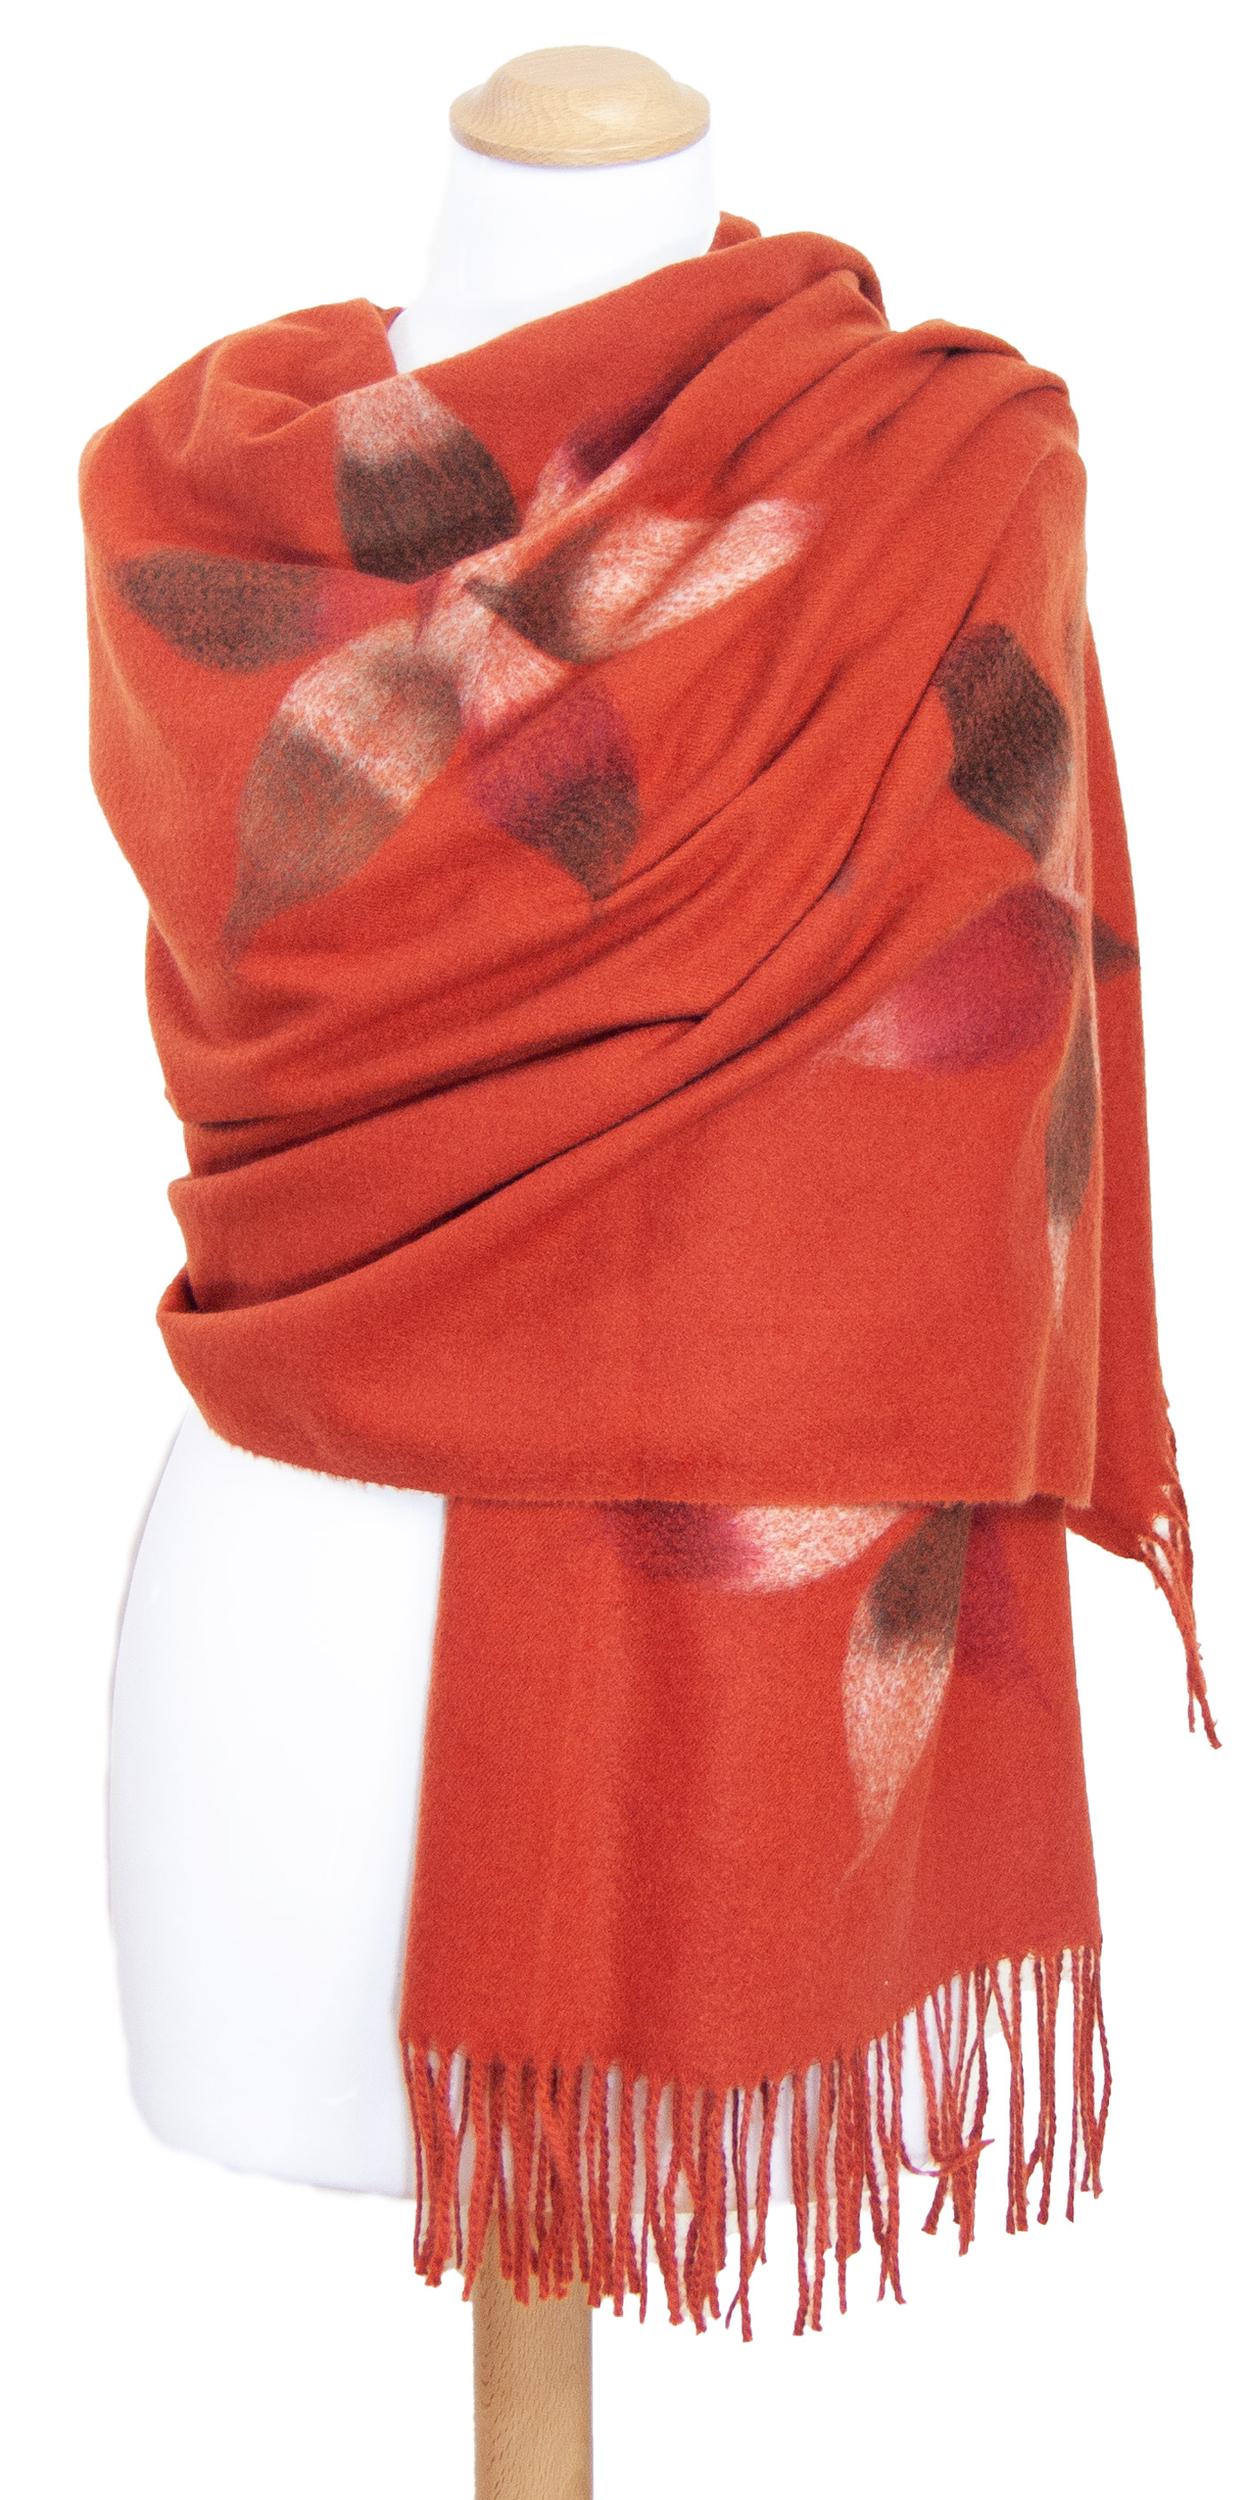 Châle orange laine fleurs Eva